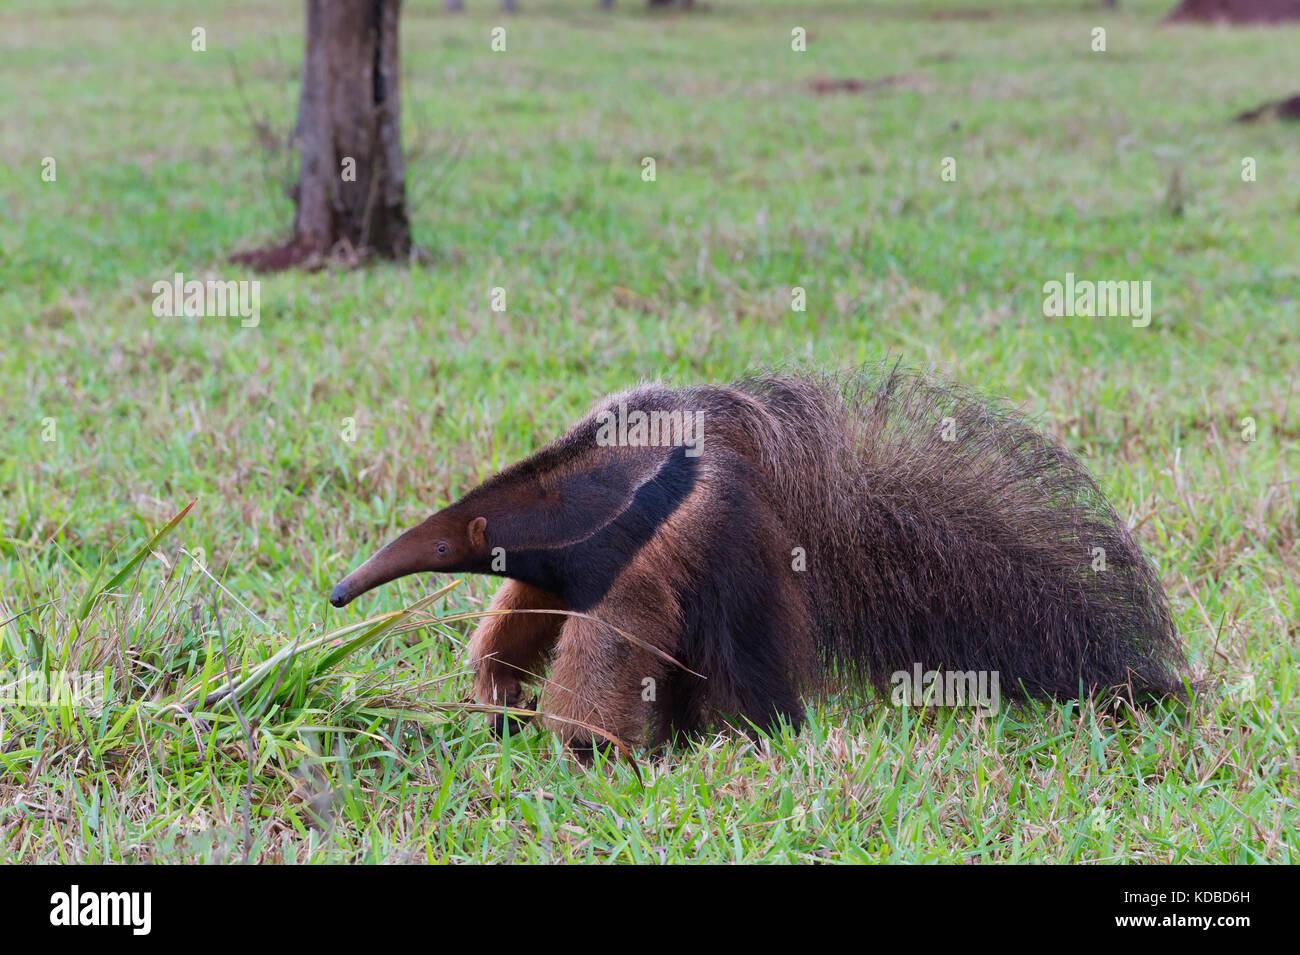 Giant Anteater (Myrmecophaga tridactyla), Mato Grosso, Brazil - Stock Image